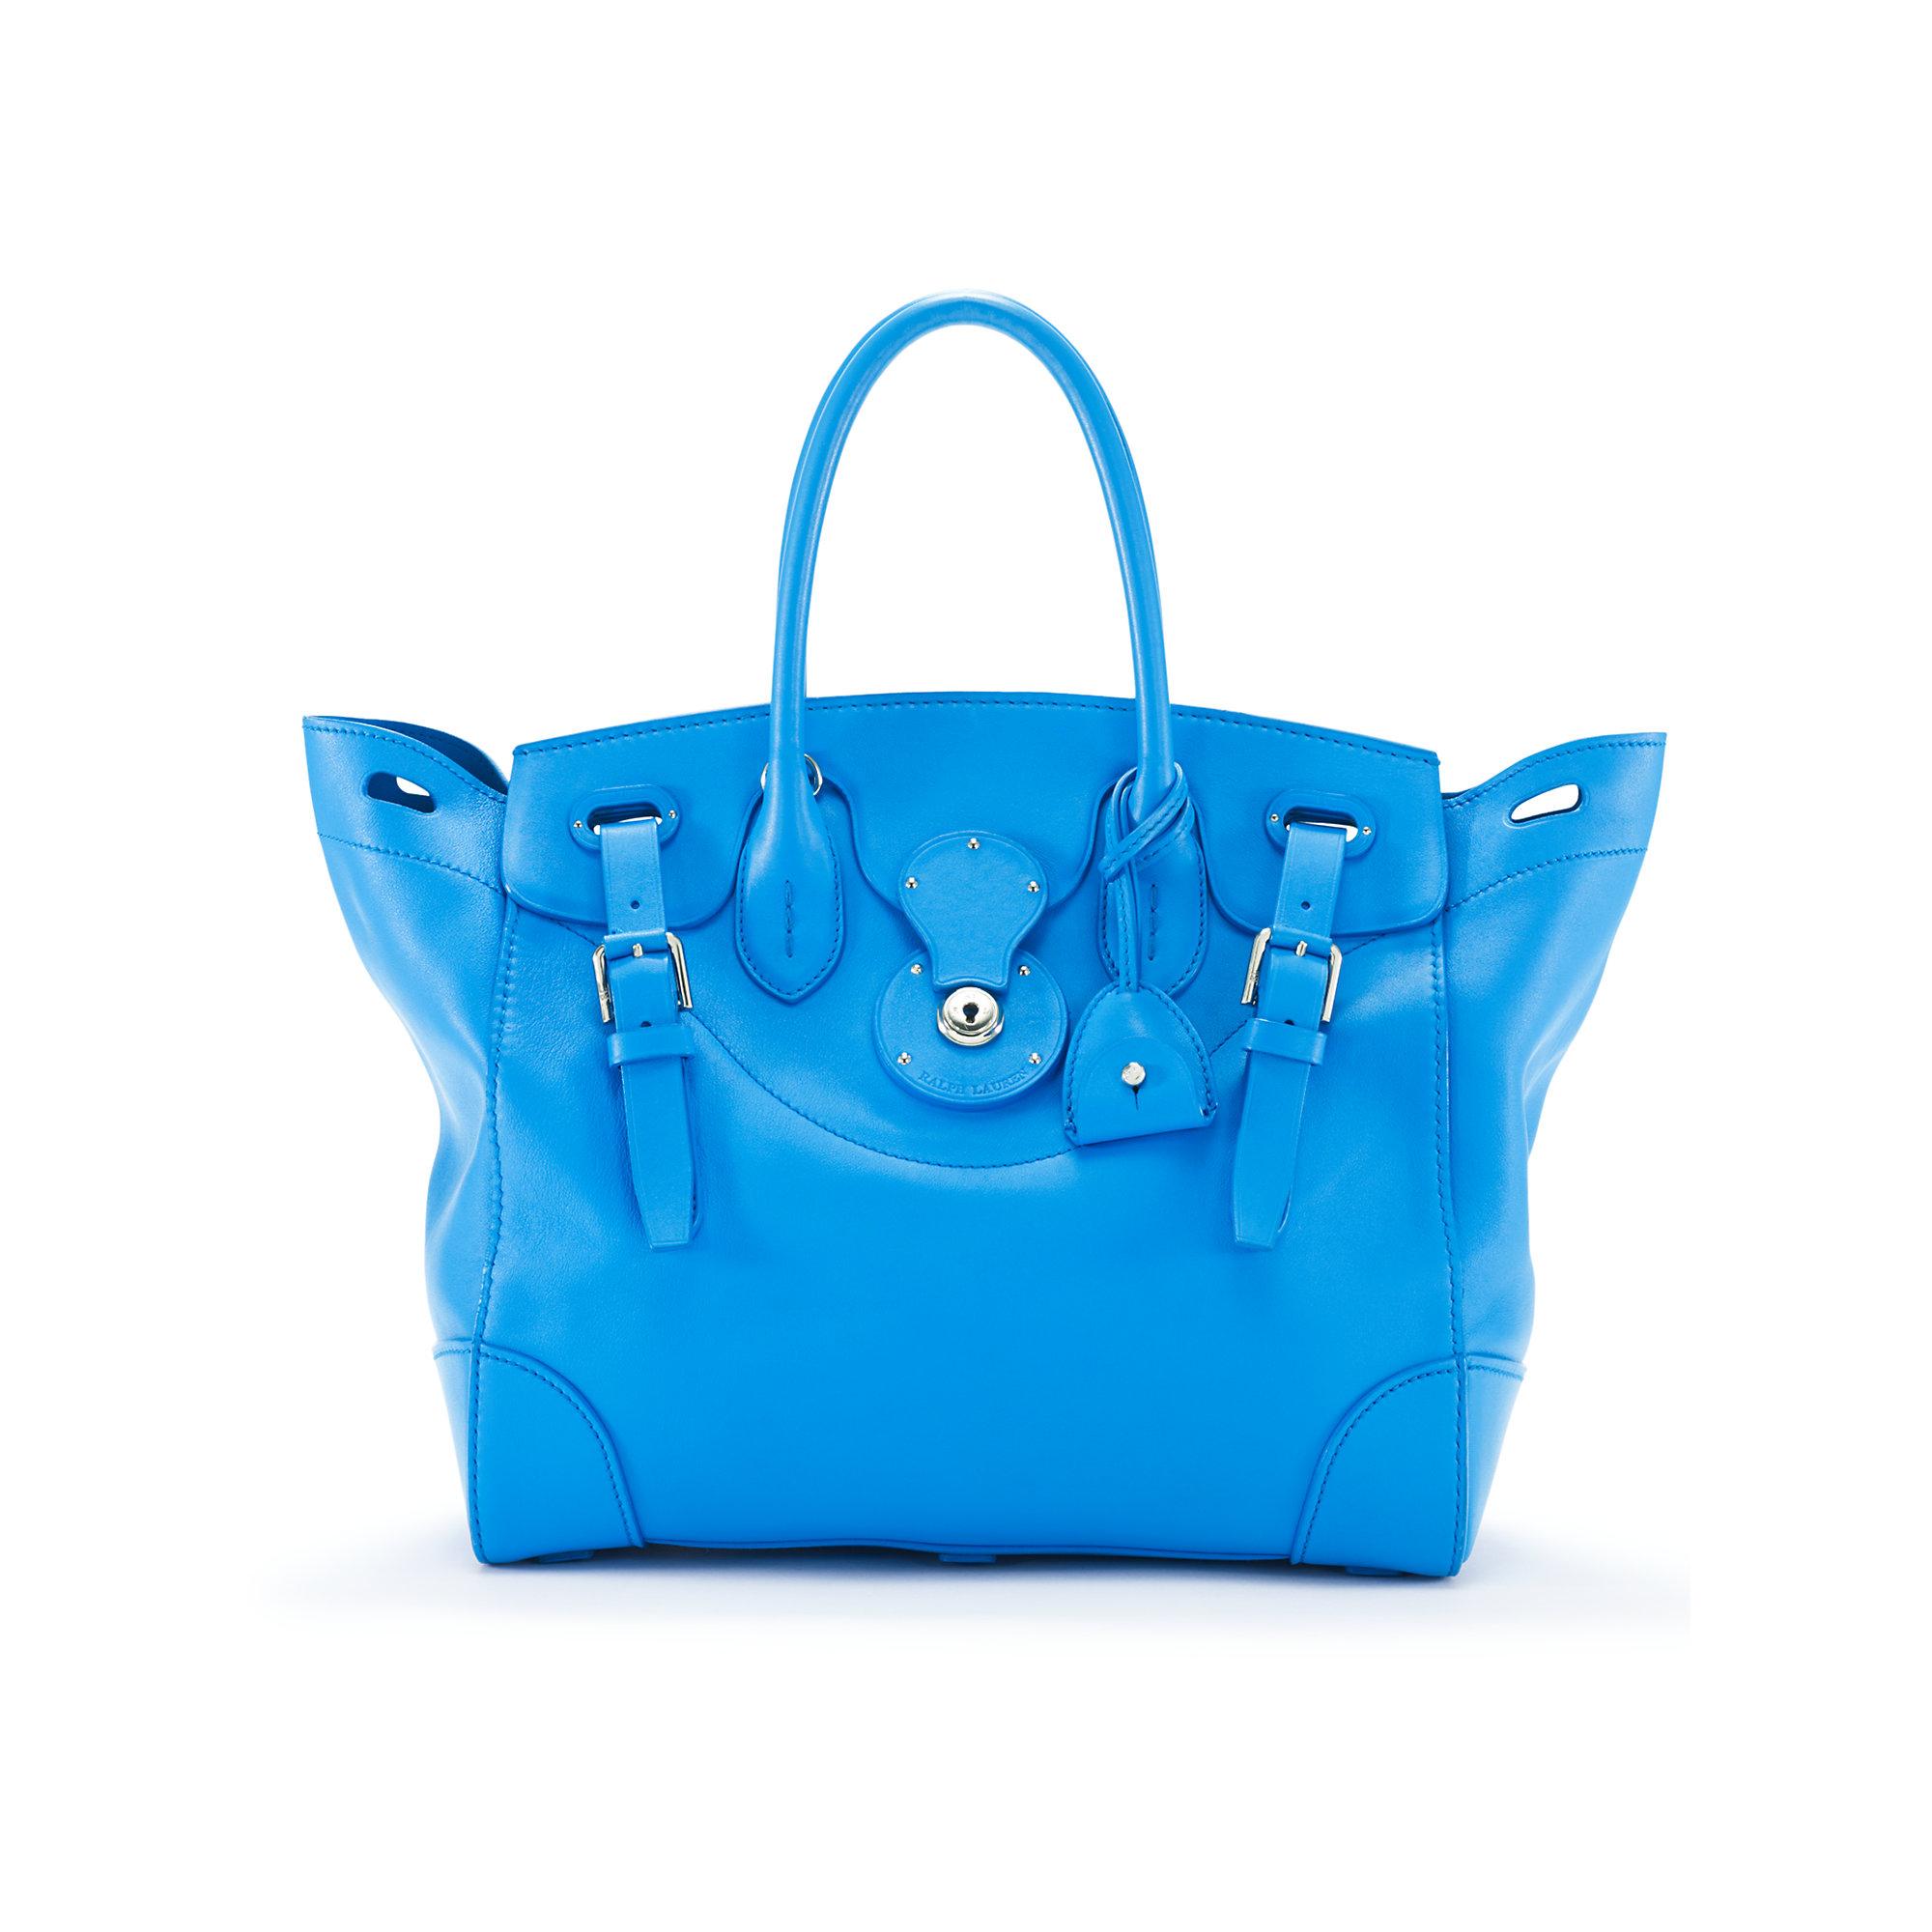 Lyst - Pink Pony Soft Ricky Bag in Metallic 6993d86b68ac9